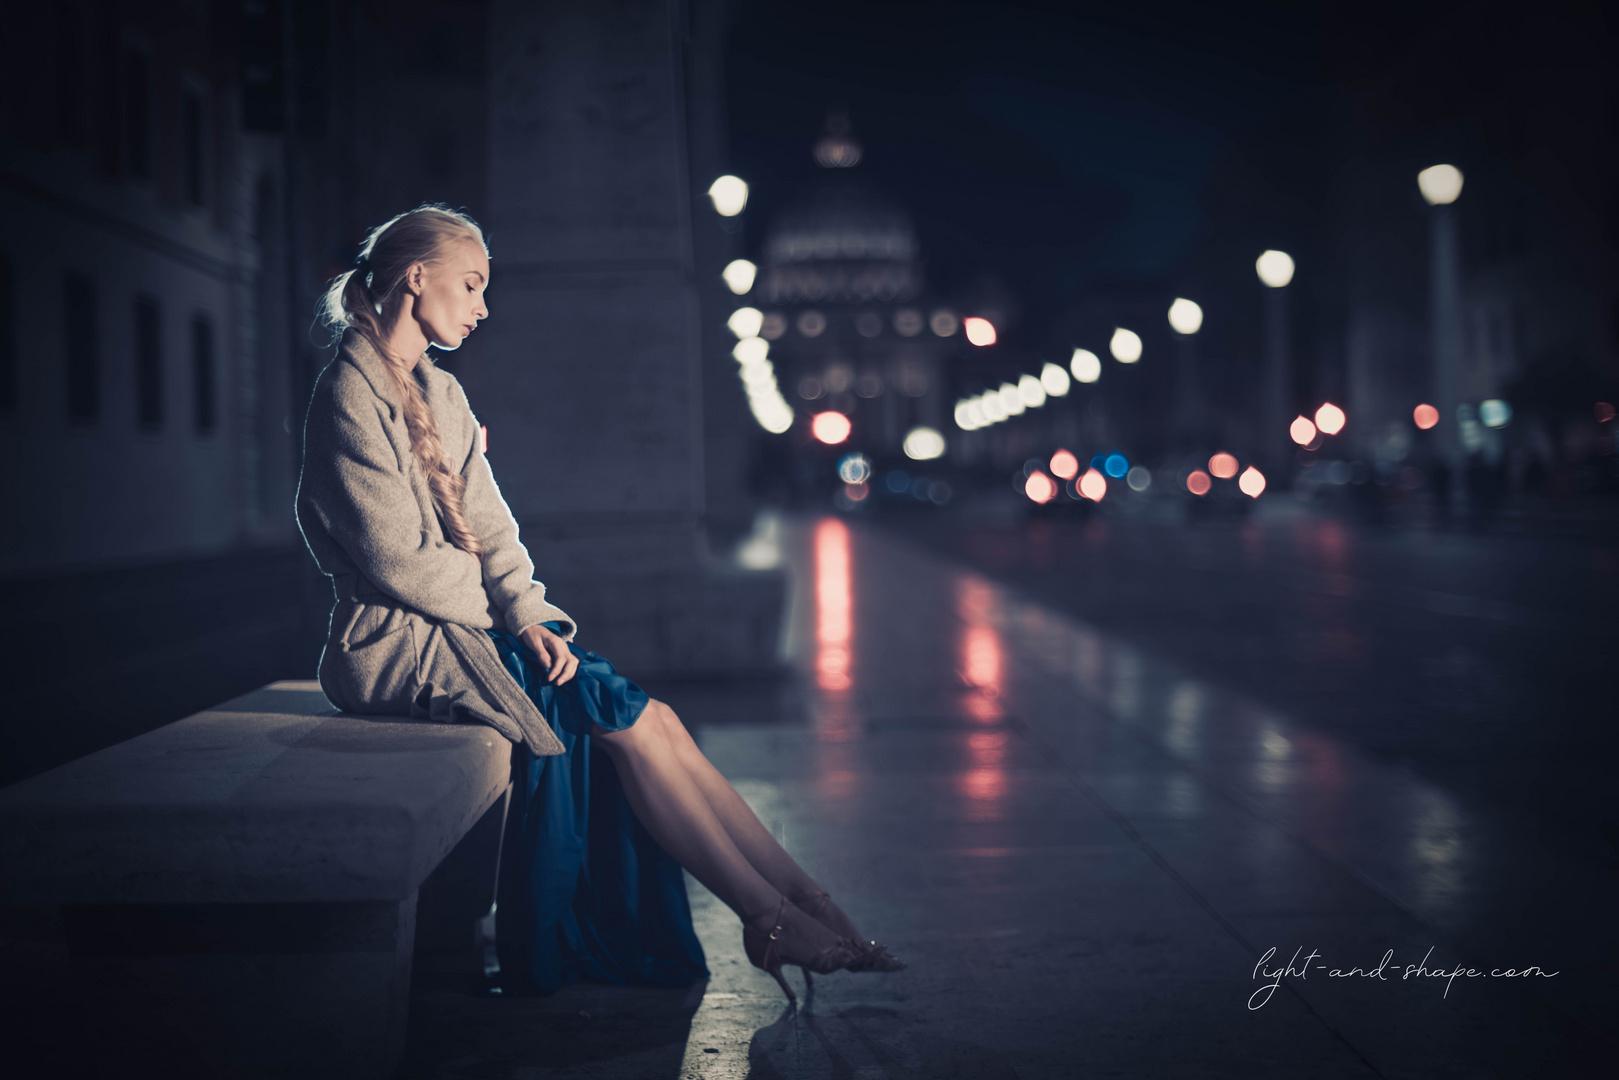 Night Shot in Rome